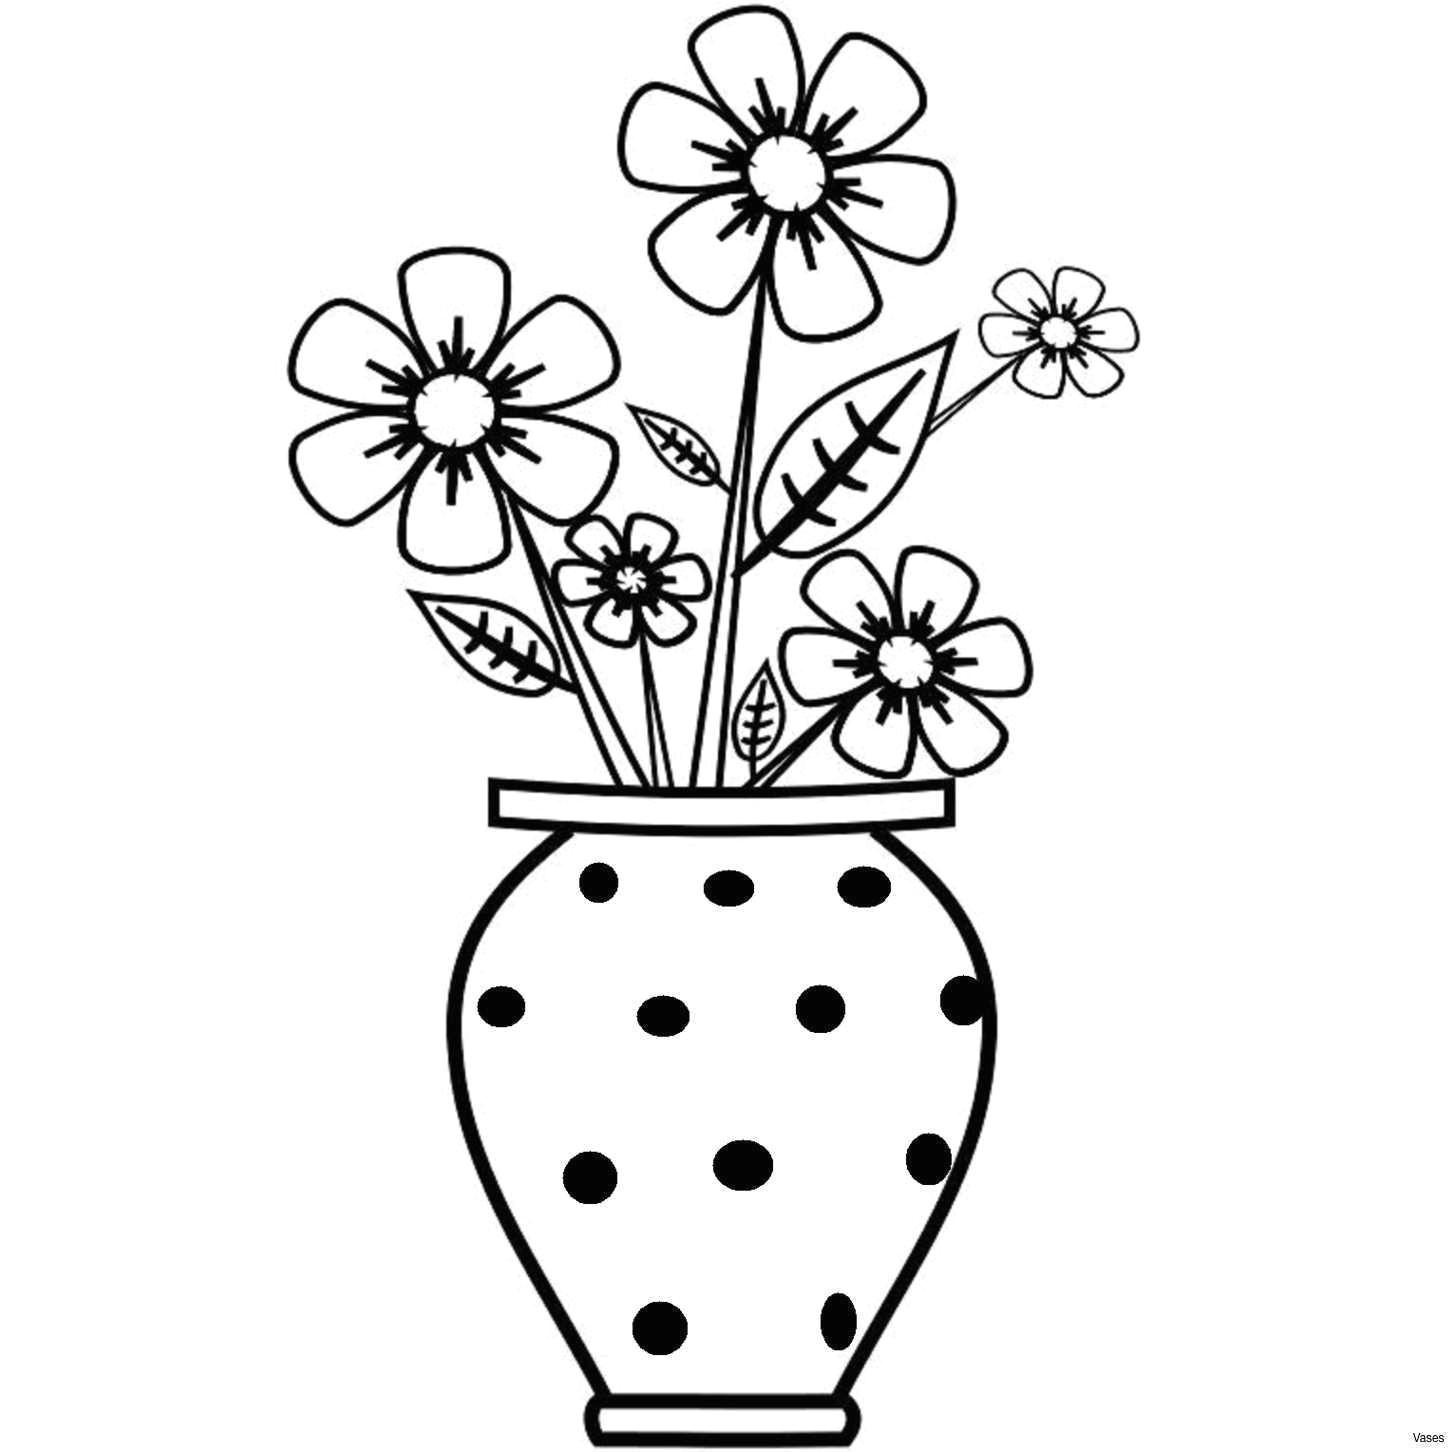 black and white art inspirational will clipart colored flower vase clip arth vases art infoi 0d